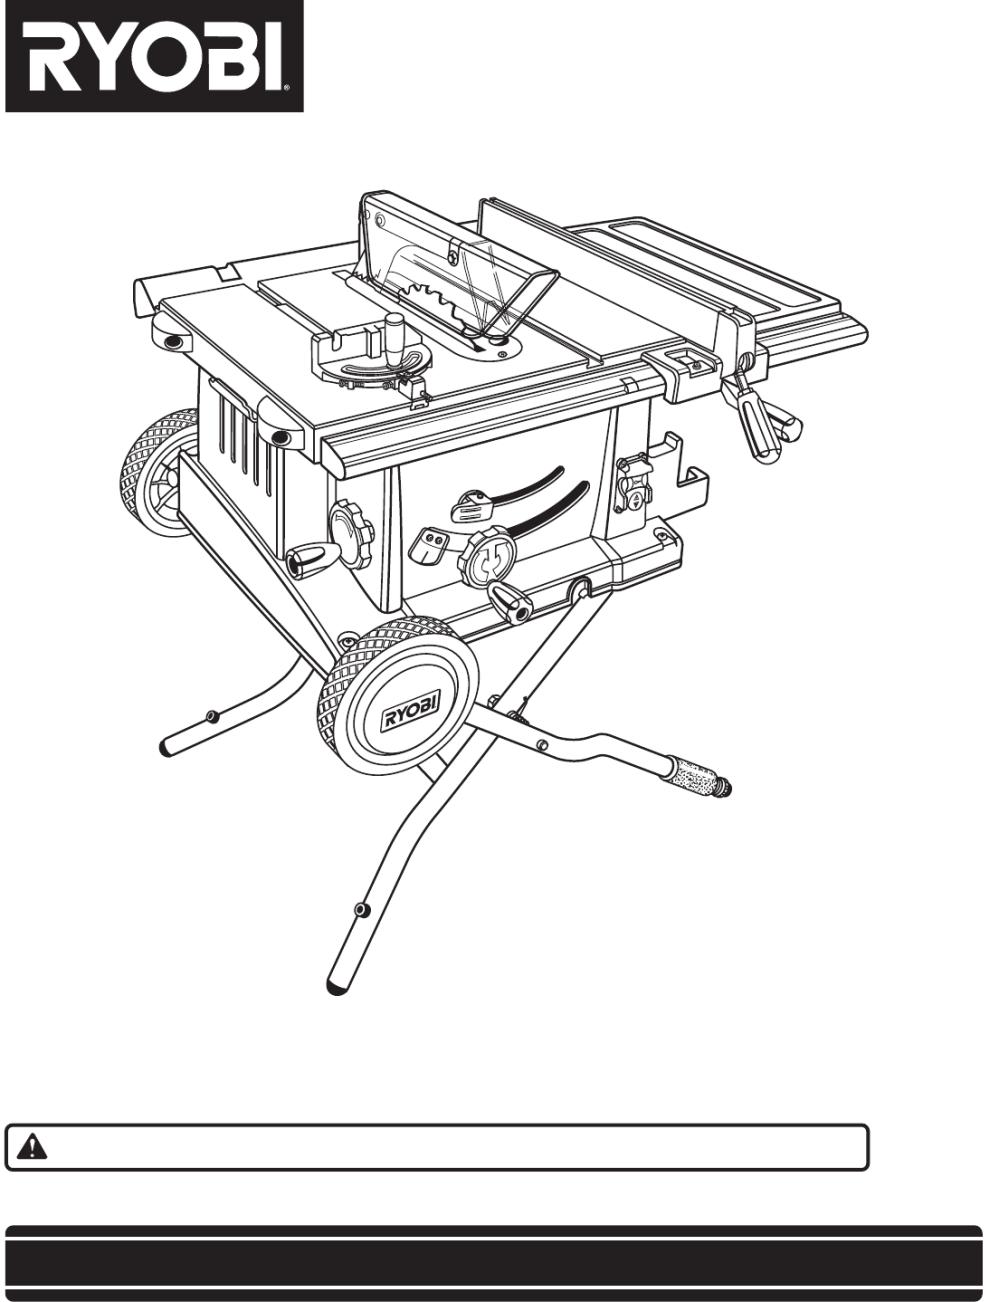 medium resolution of  ryobi bts20r manual on ryobi bts15 rip fence used ridgid table saw ryobi bts15 ryobi bts table saw wiring diagram